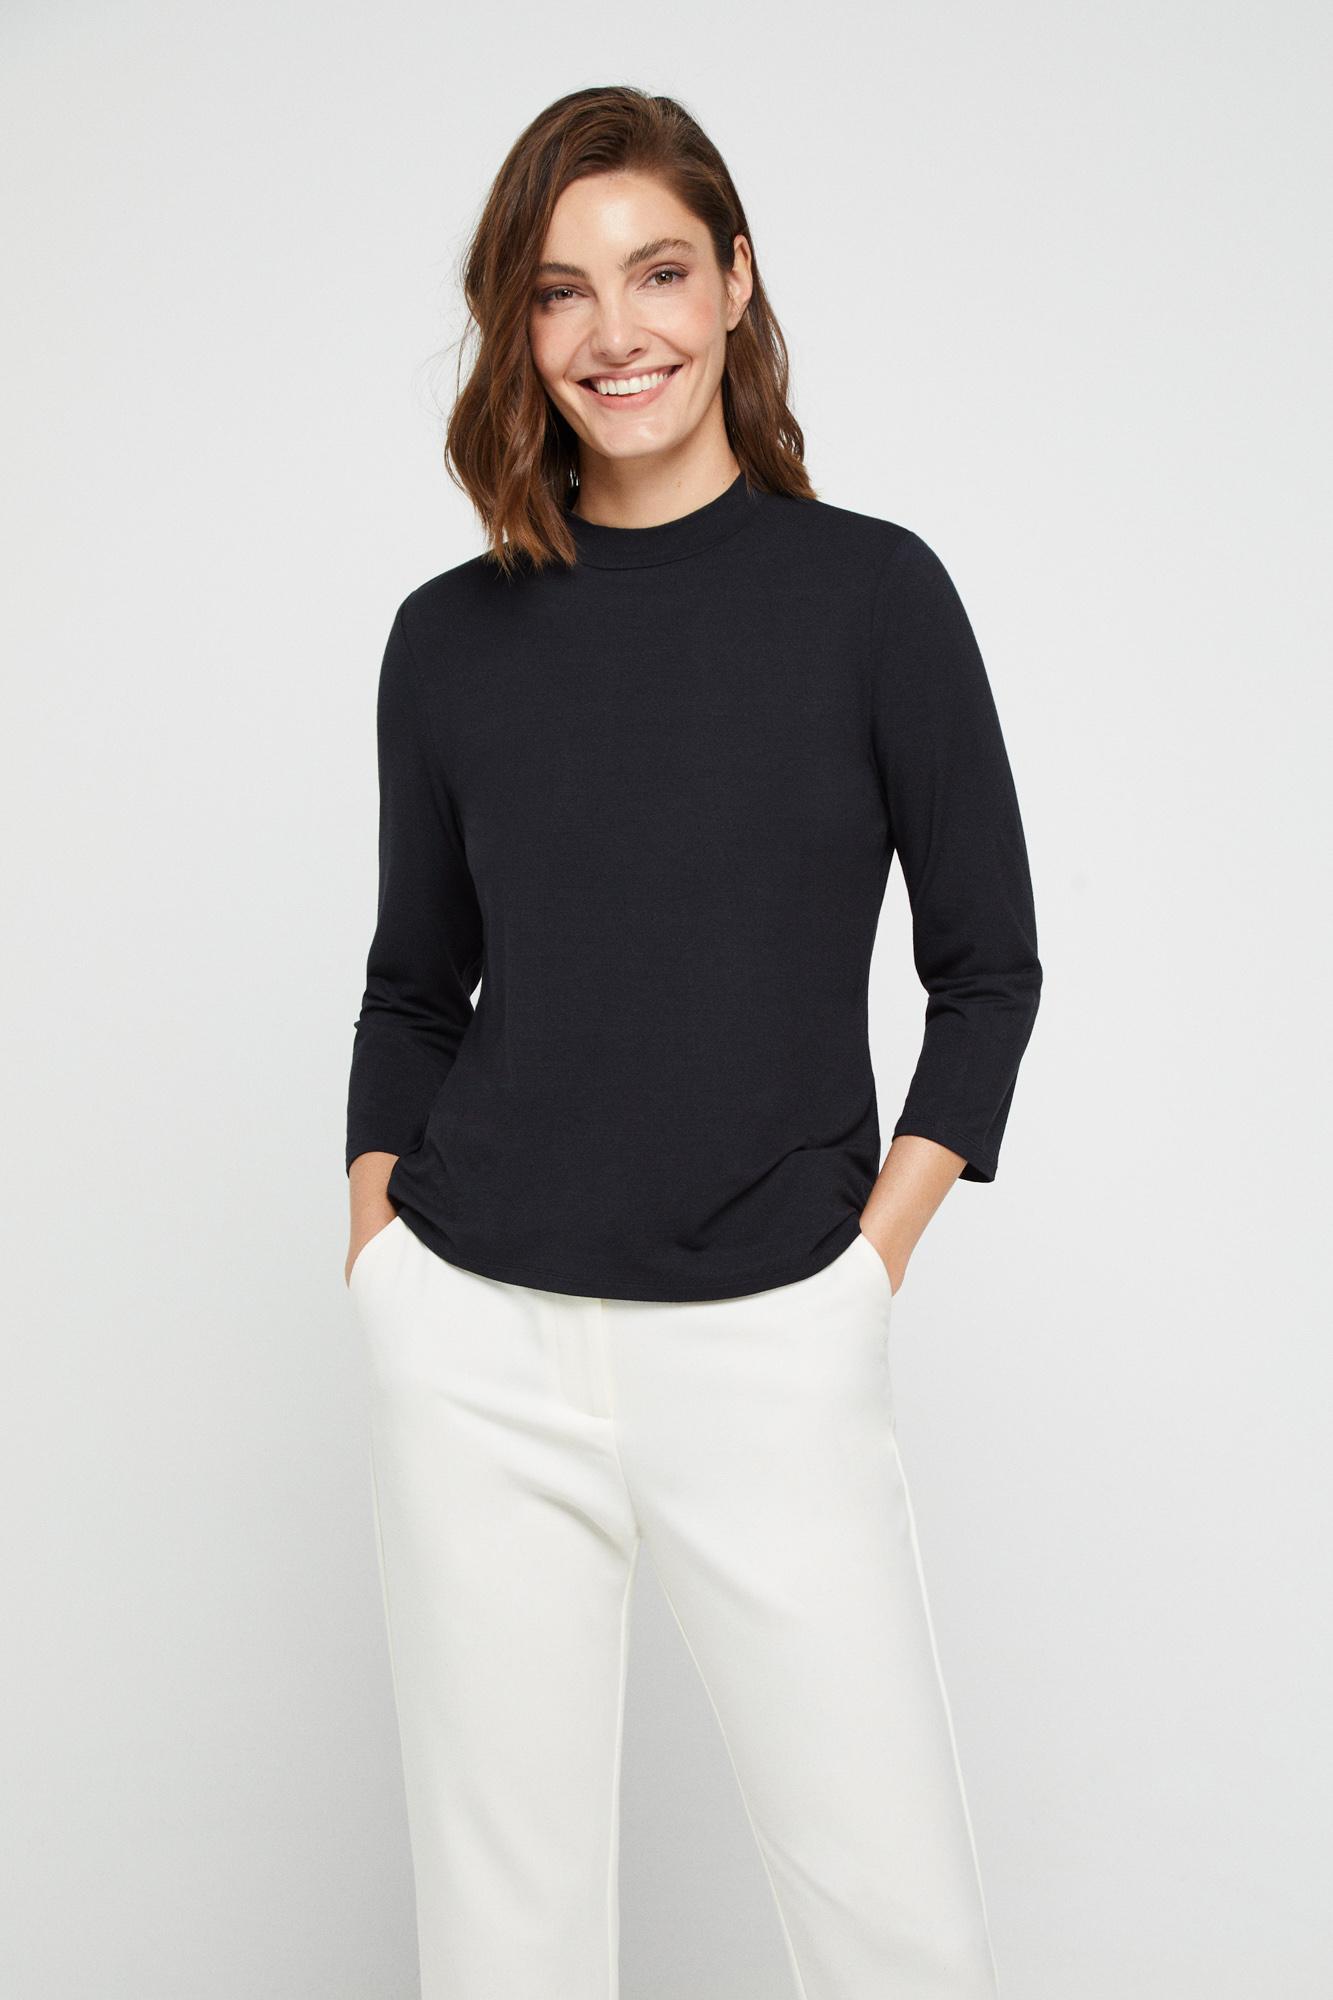 Camiseta perkins modal